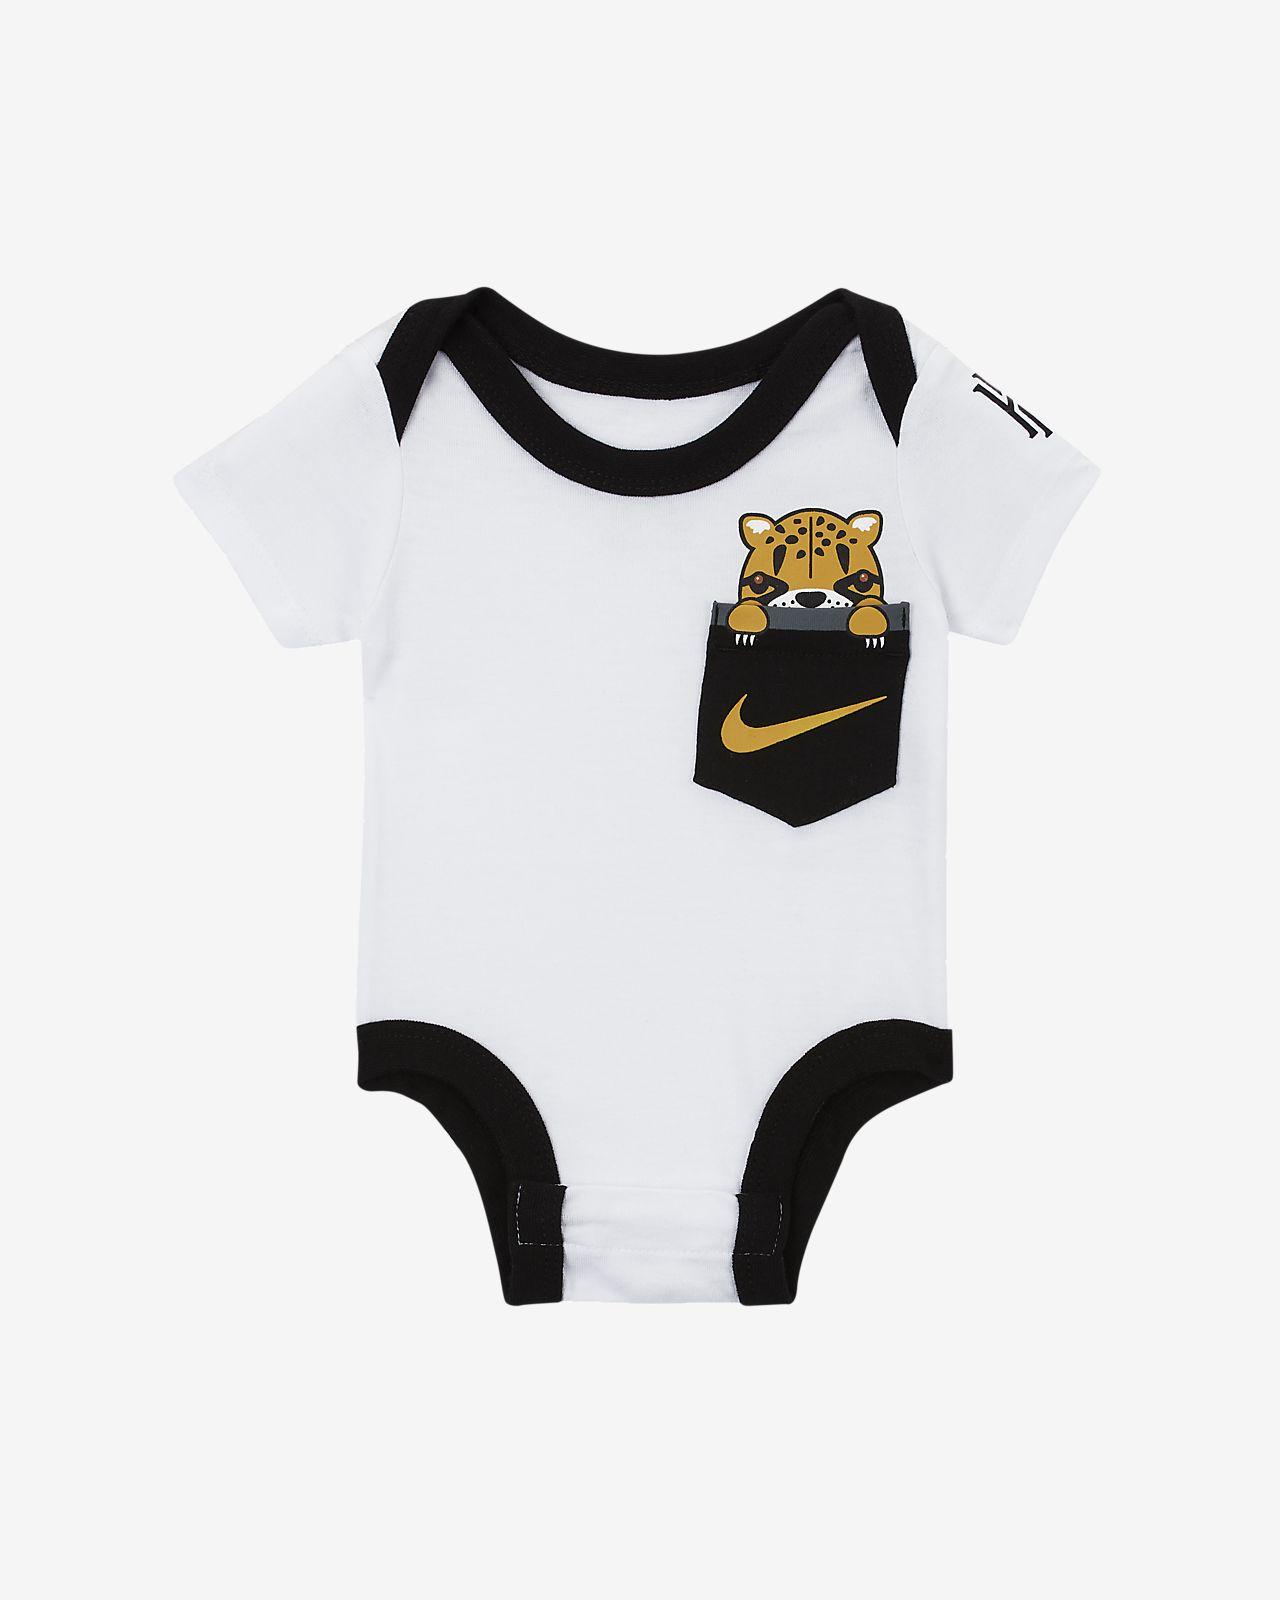 on sale e7620 cfaea Kyrie Little Big Cats Infant Bodysuit. Nike.com